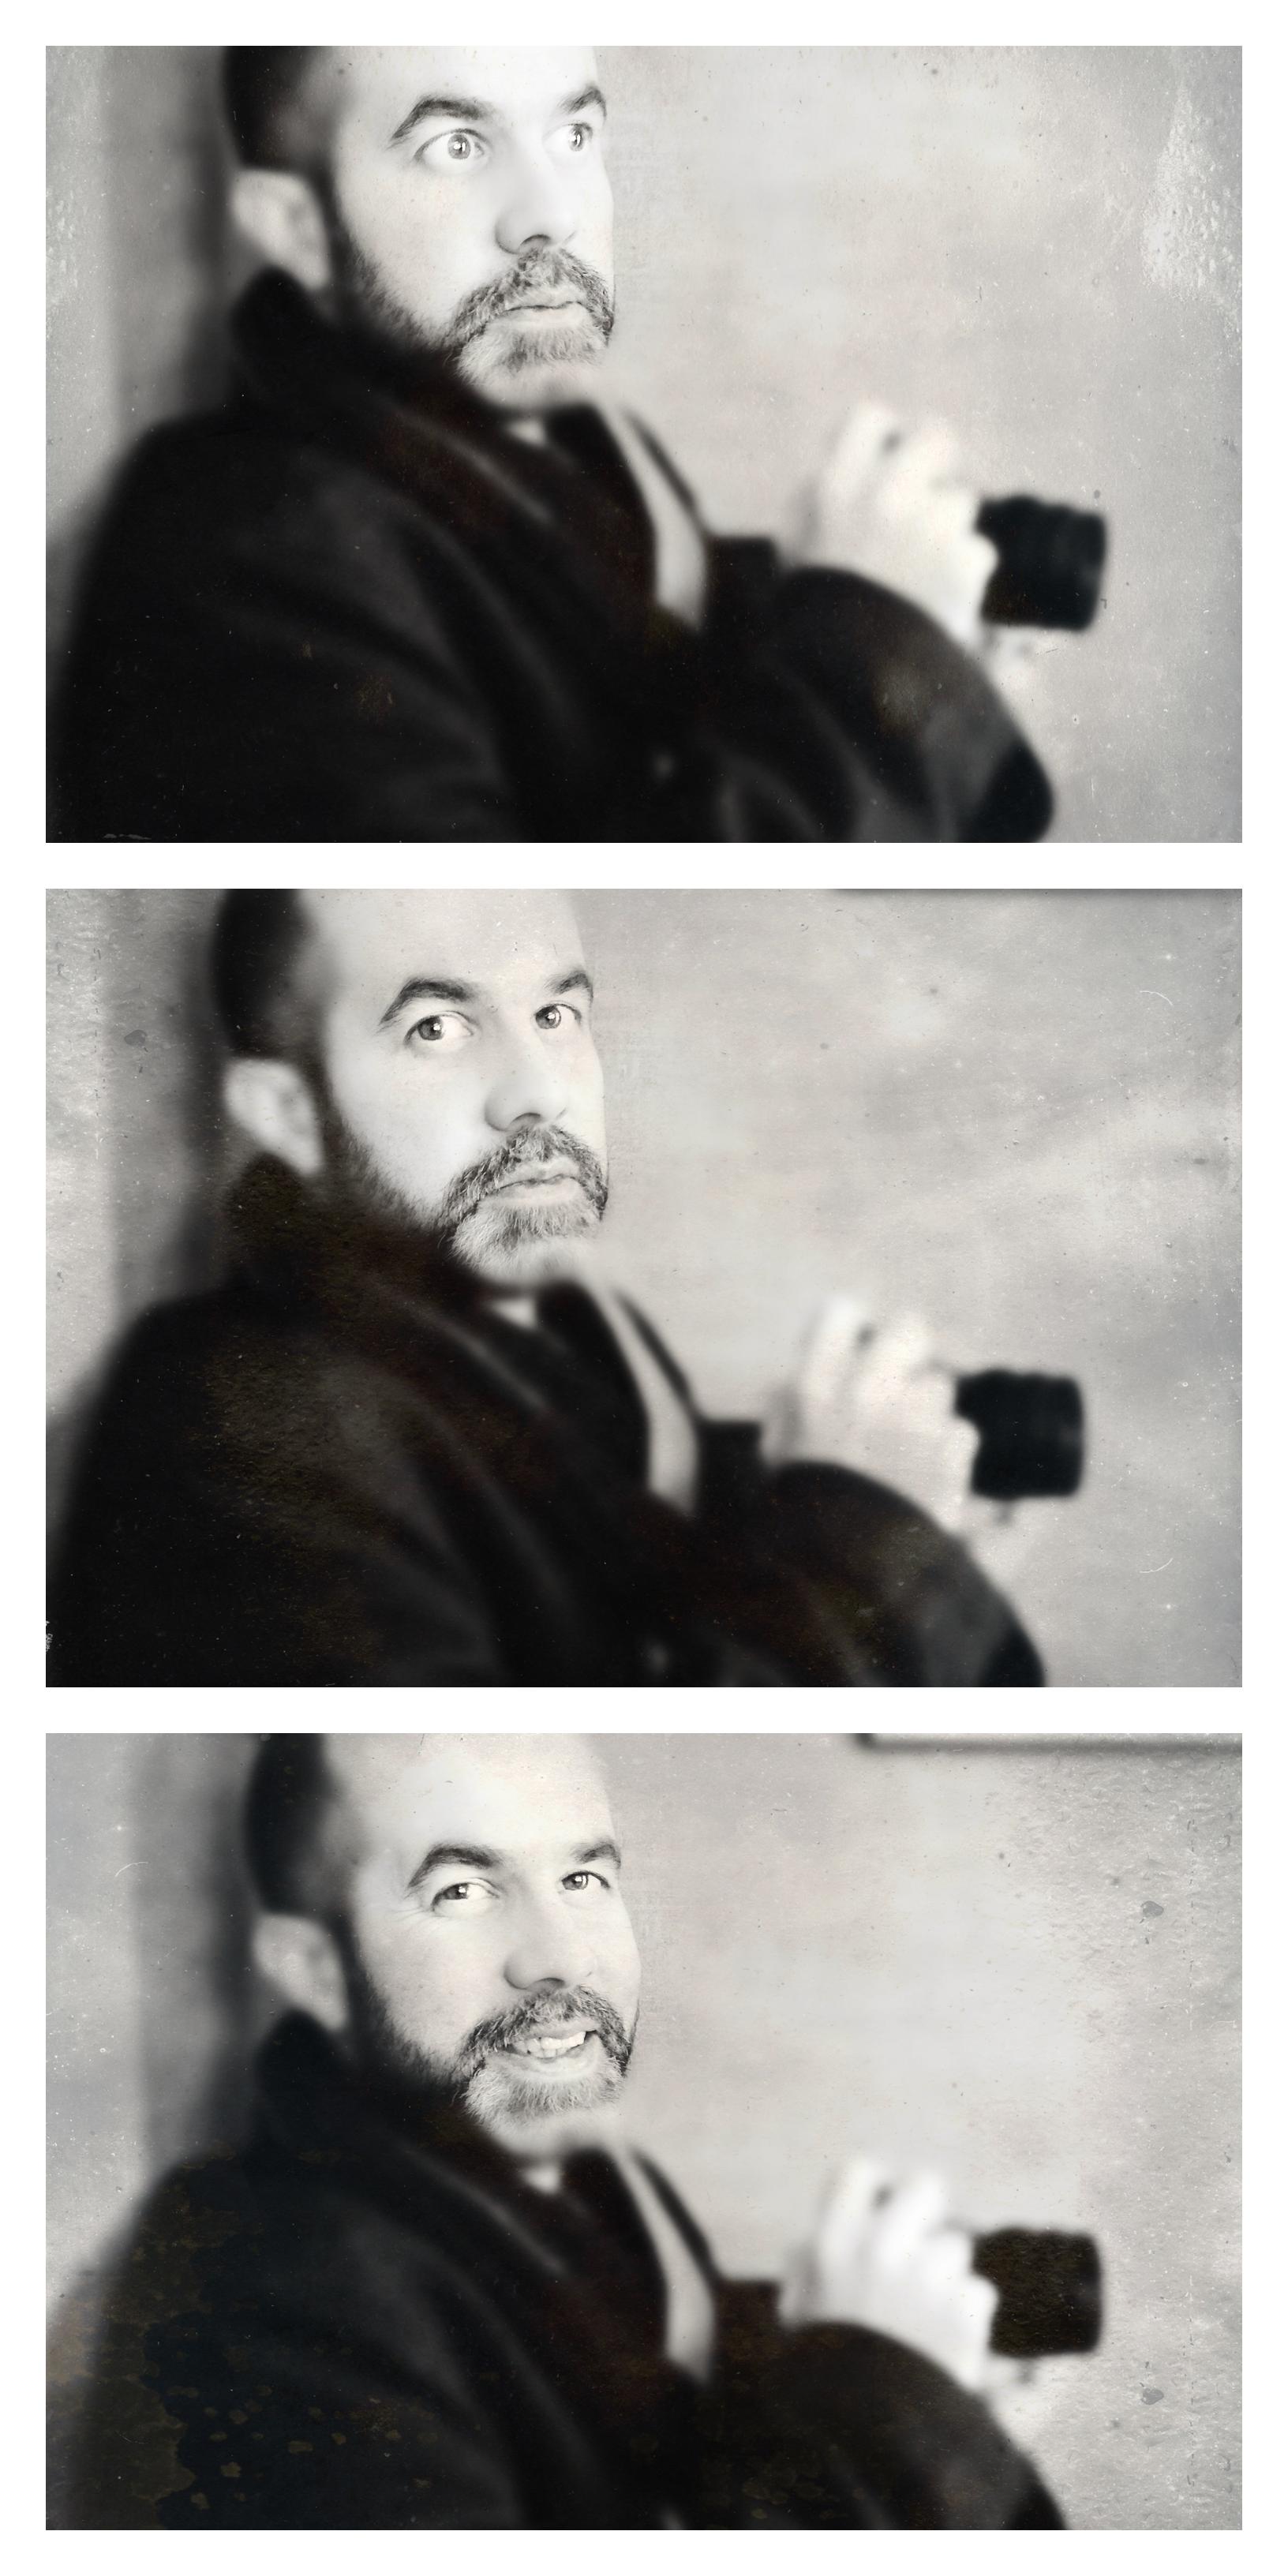 Aidan with camera